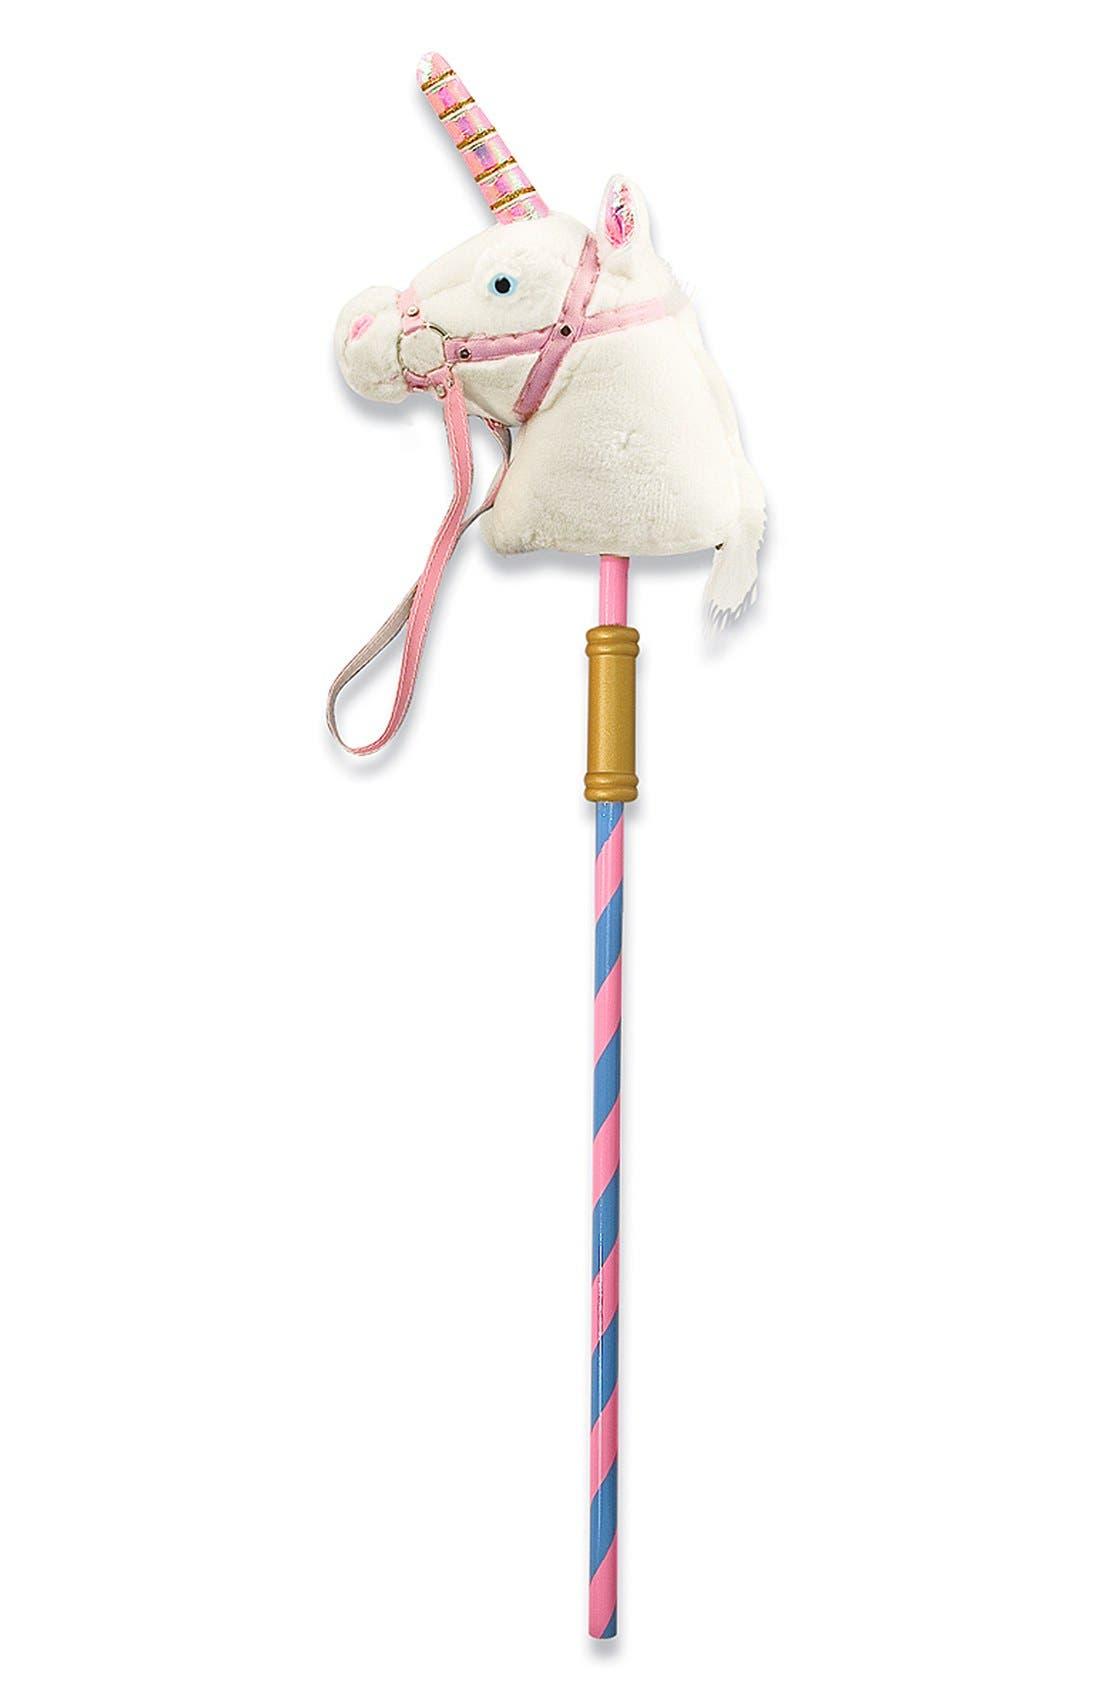 'Prance-n-Play' Stick Unicorn,                             Main thumbnail 1, color,                             Pink